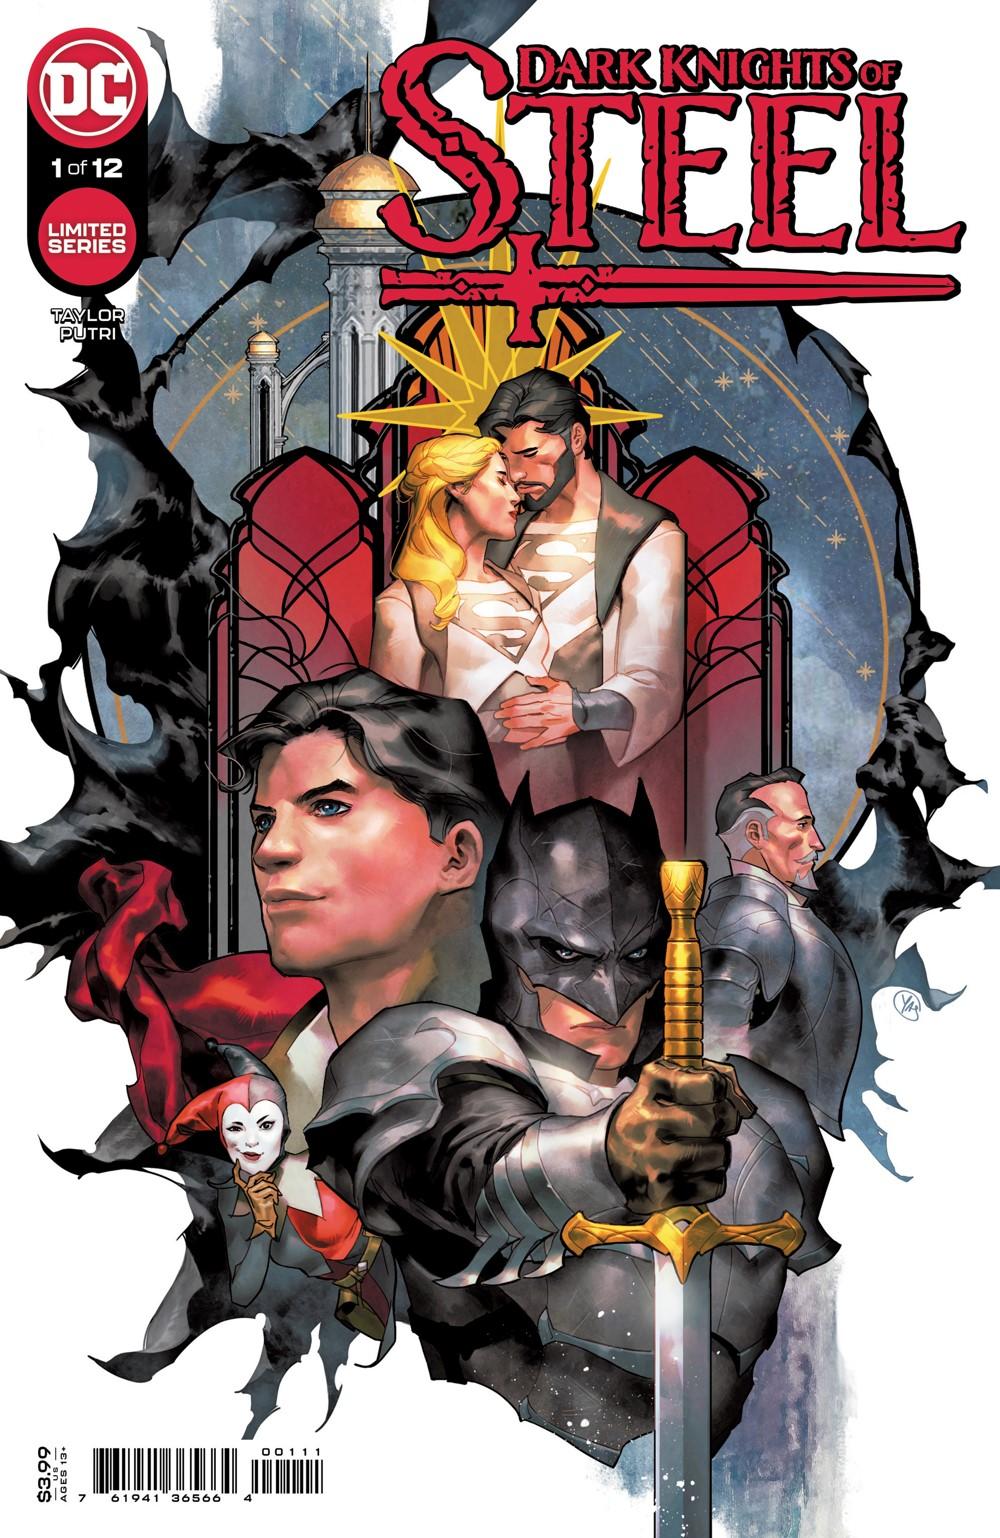 Dark_Knights_of_Steel_Cv1 DC Comics November 2021 Solicitations